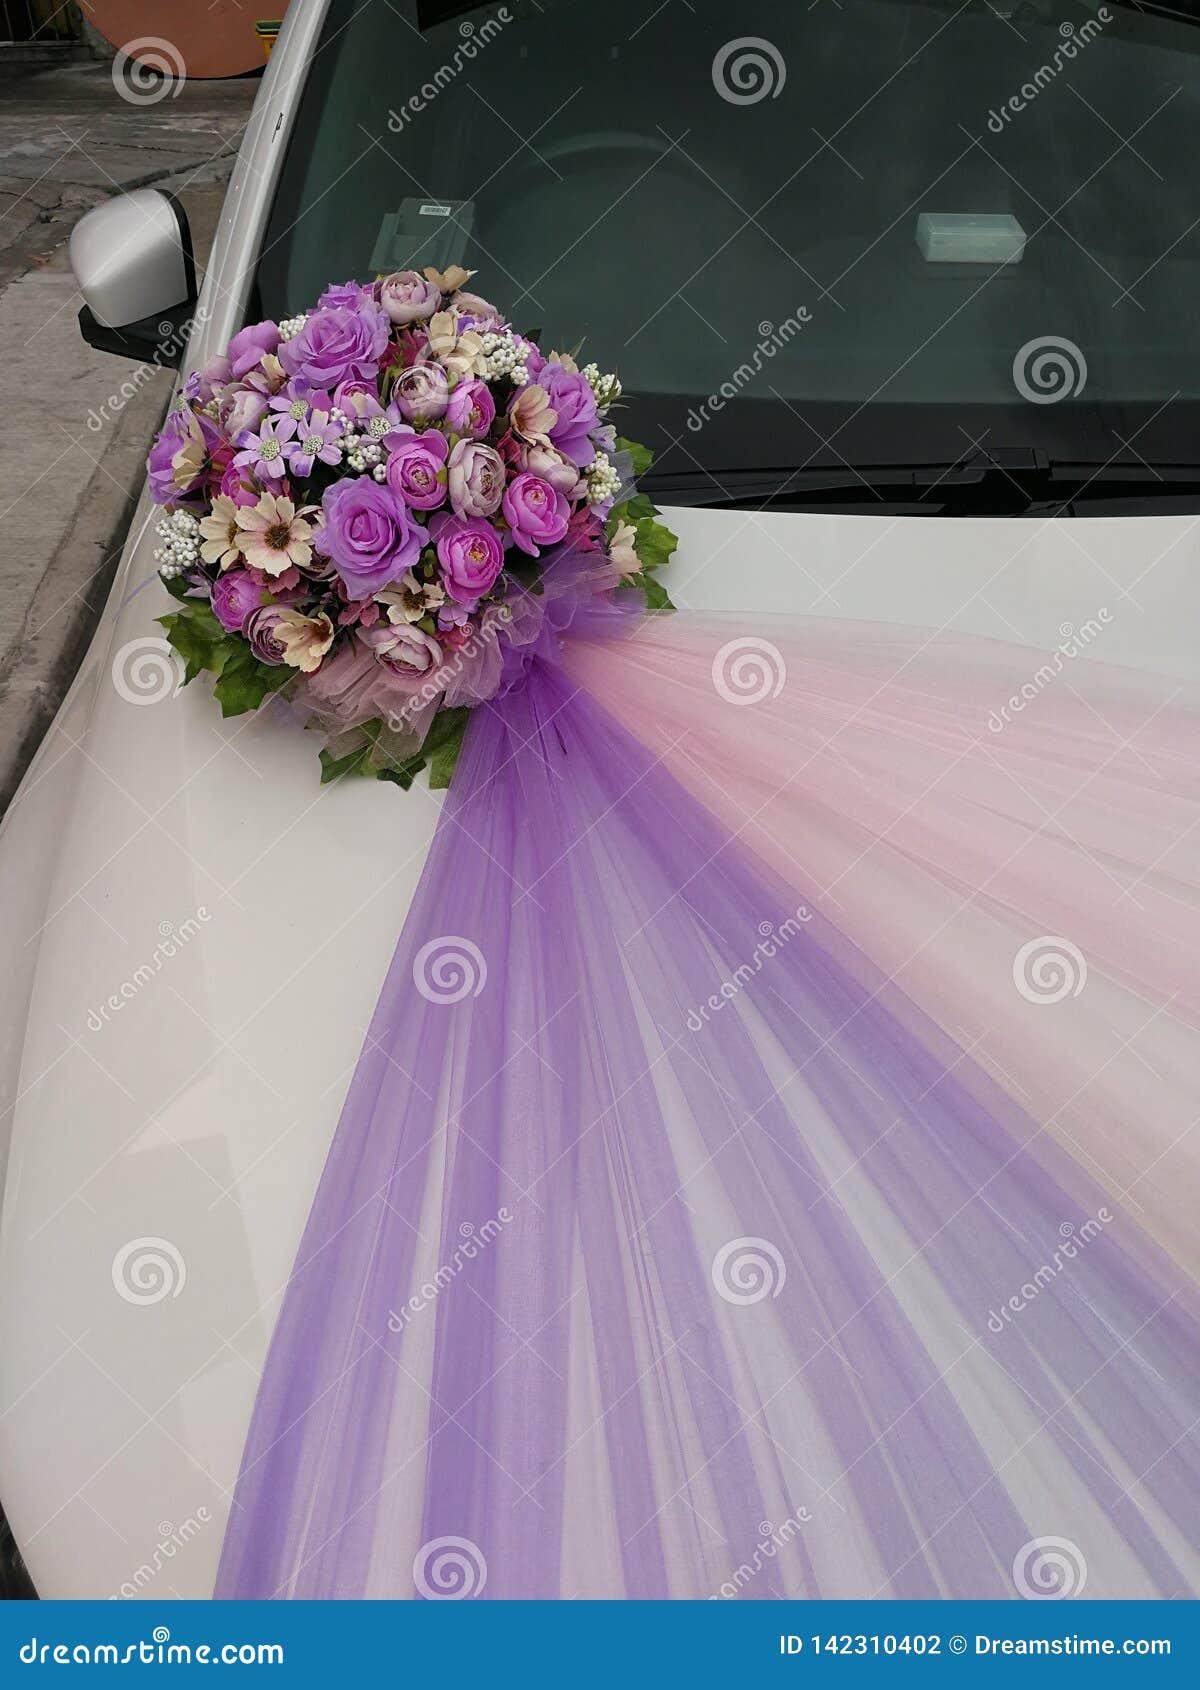 Wedding Car Decoration Artificial Flower Arrangement Stock